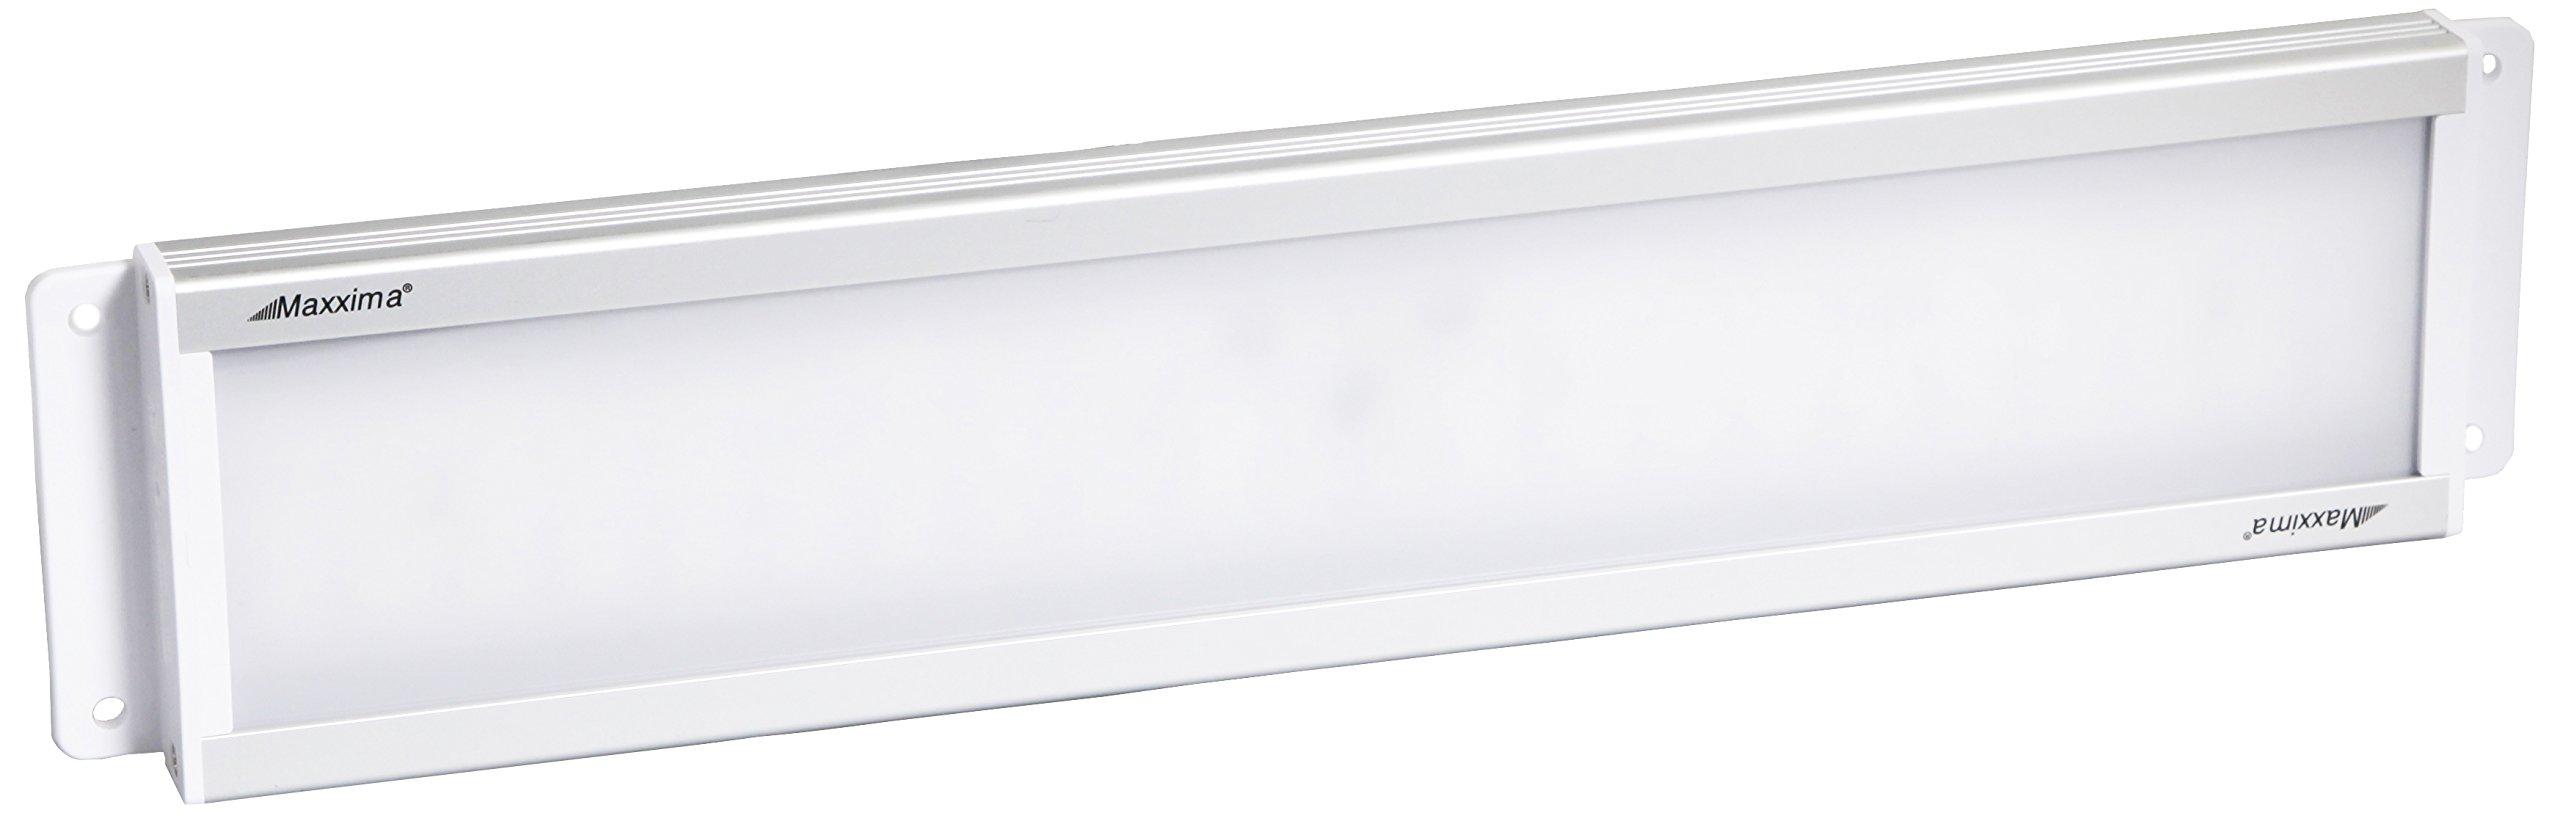 Maxxima M84416 Surface Mount Interior LED Cargo Light 1500 Lumens